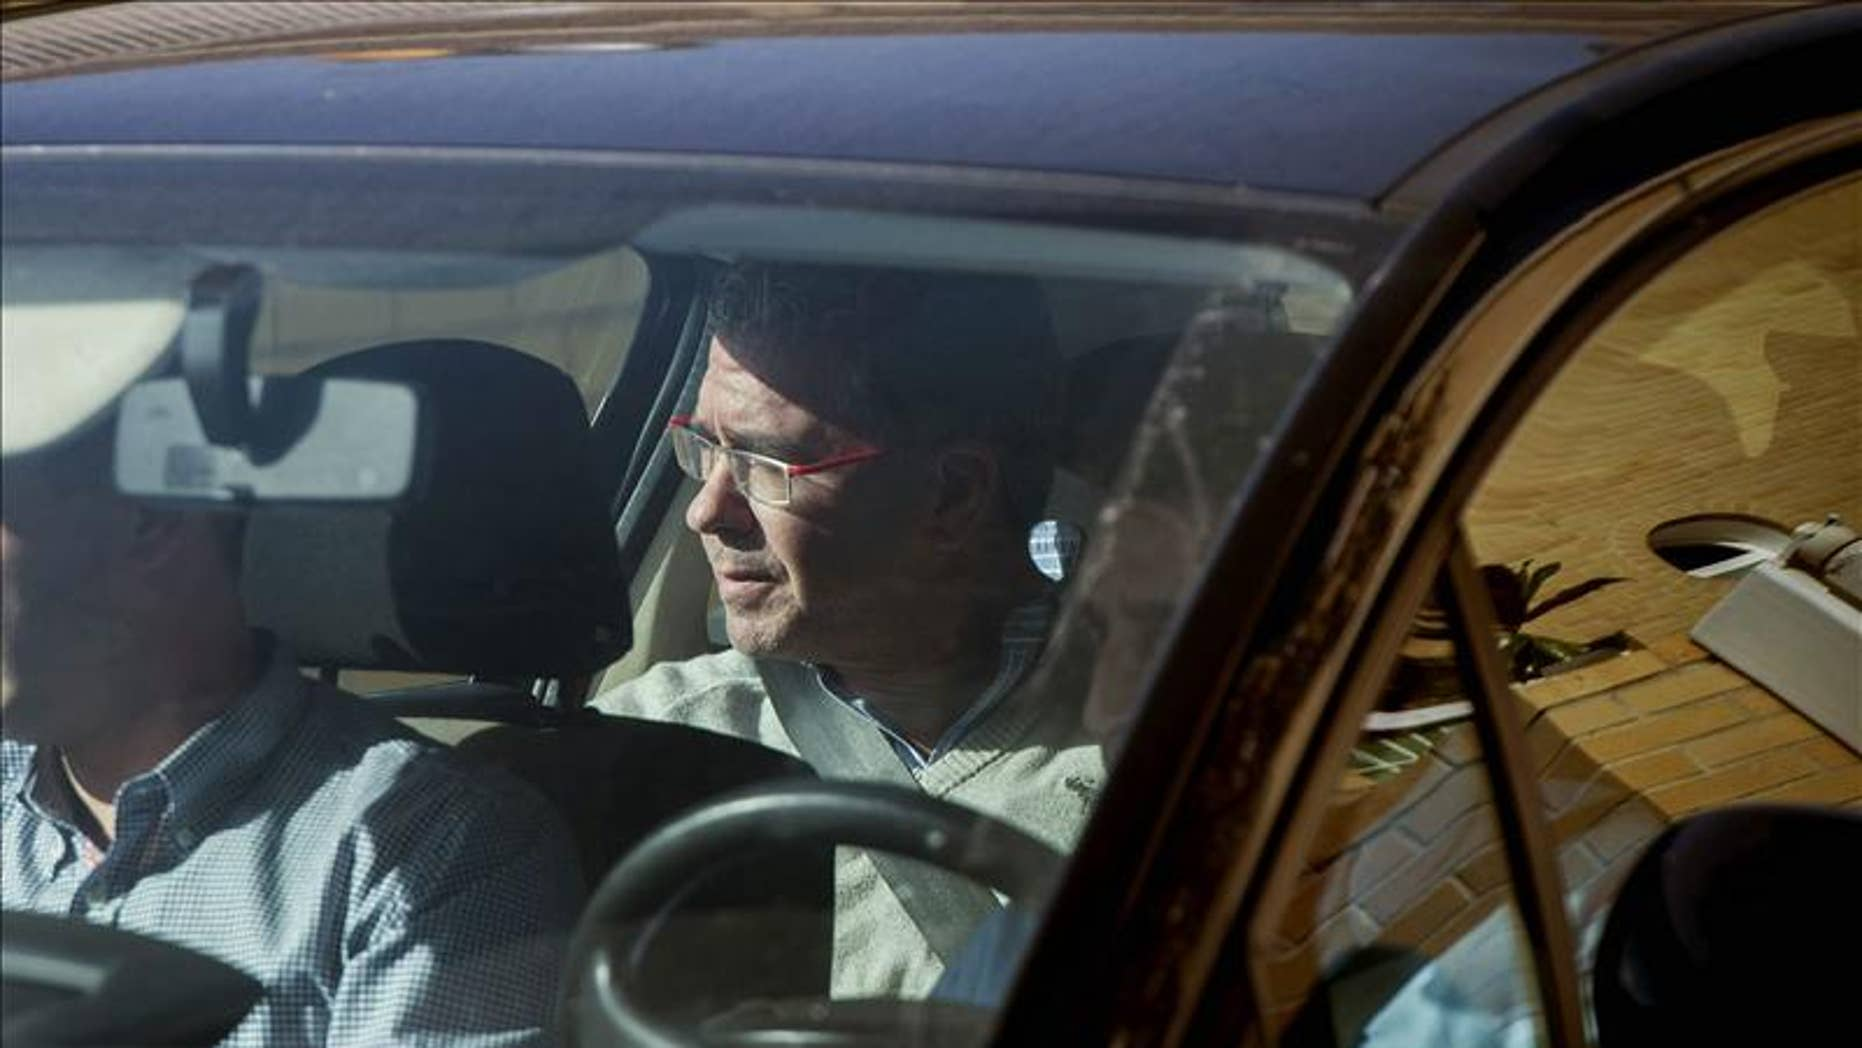 Former Mayor of Valdemoro and former regional vice president of Madrid, Francisco Granados, after his arrest on Oct. 27 2014.